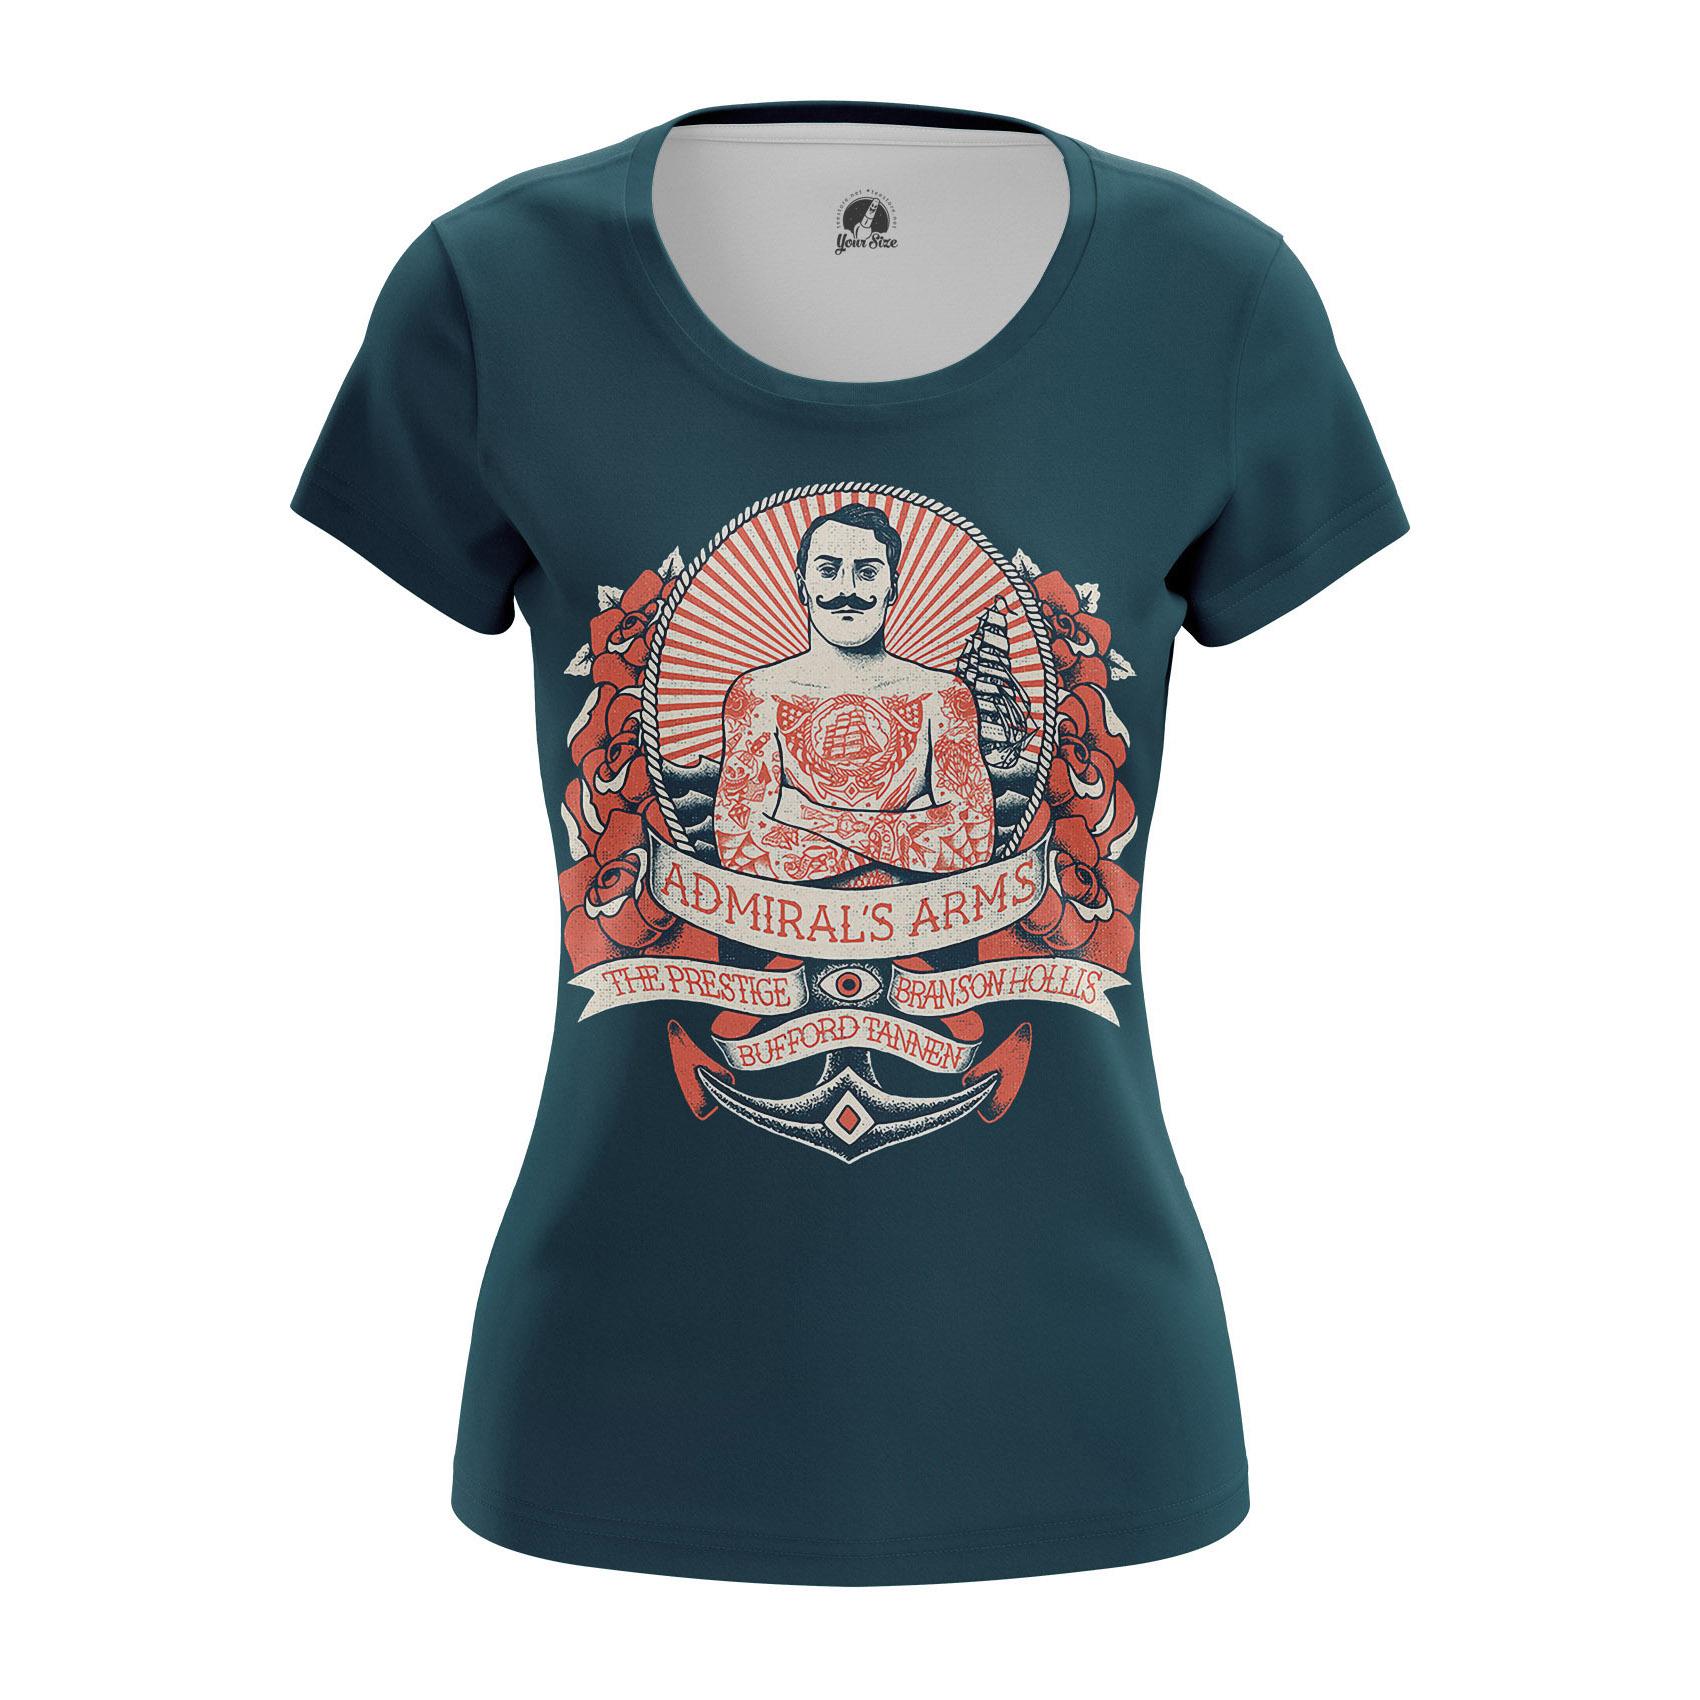 Collectibles Women'S T-Shirt Admirals Arms